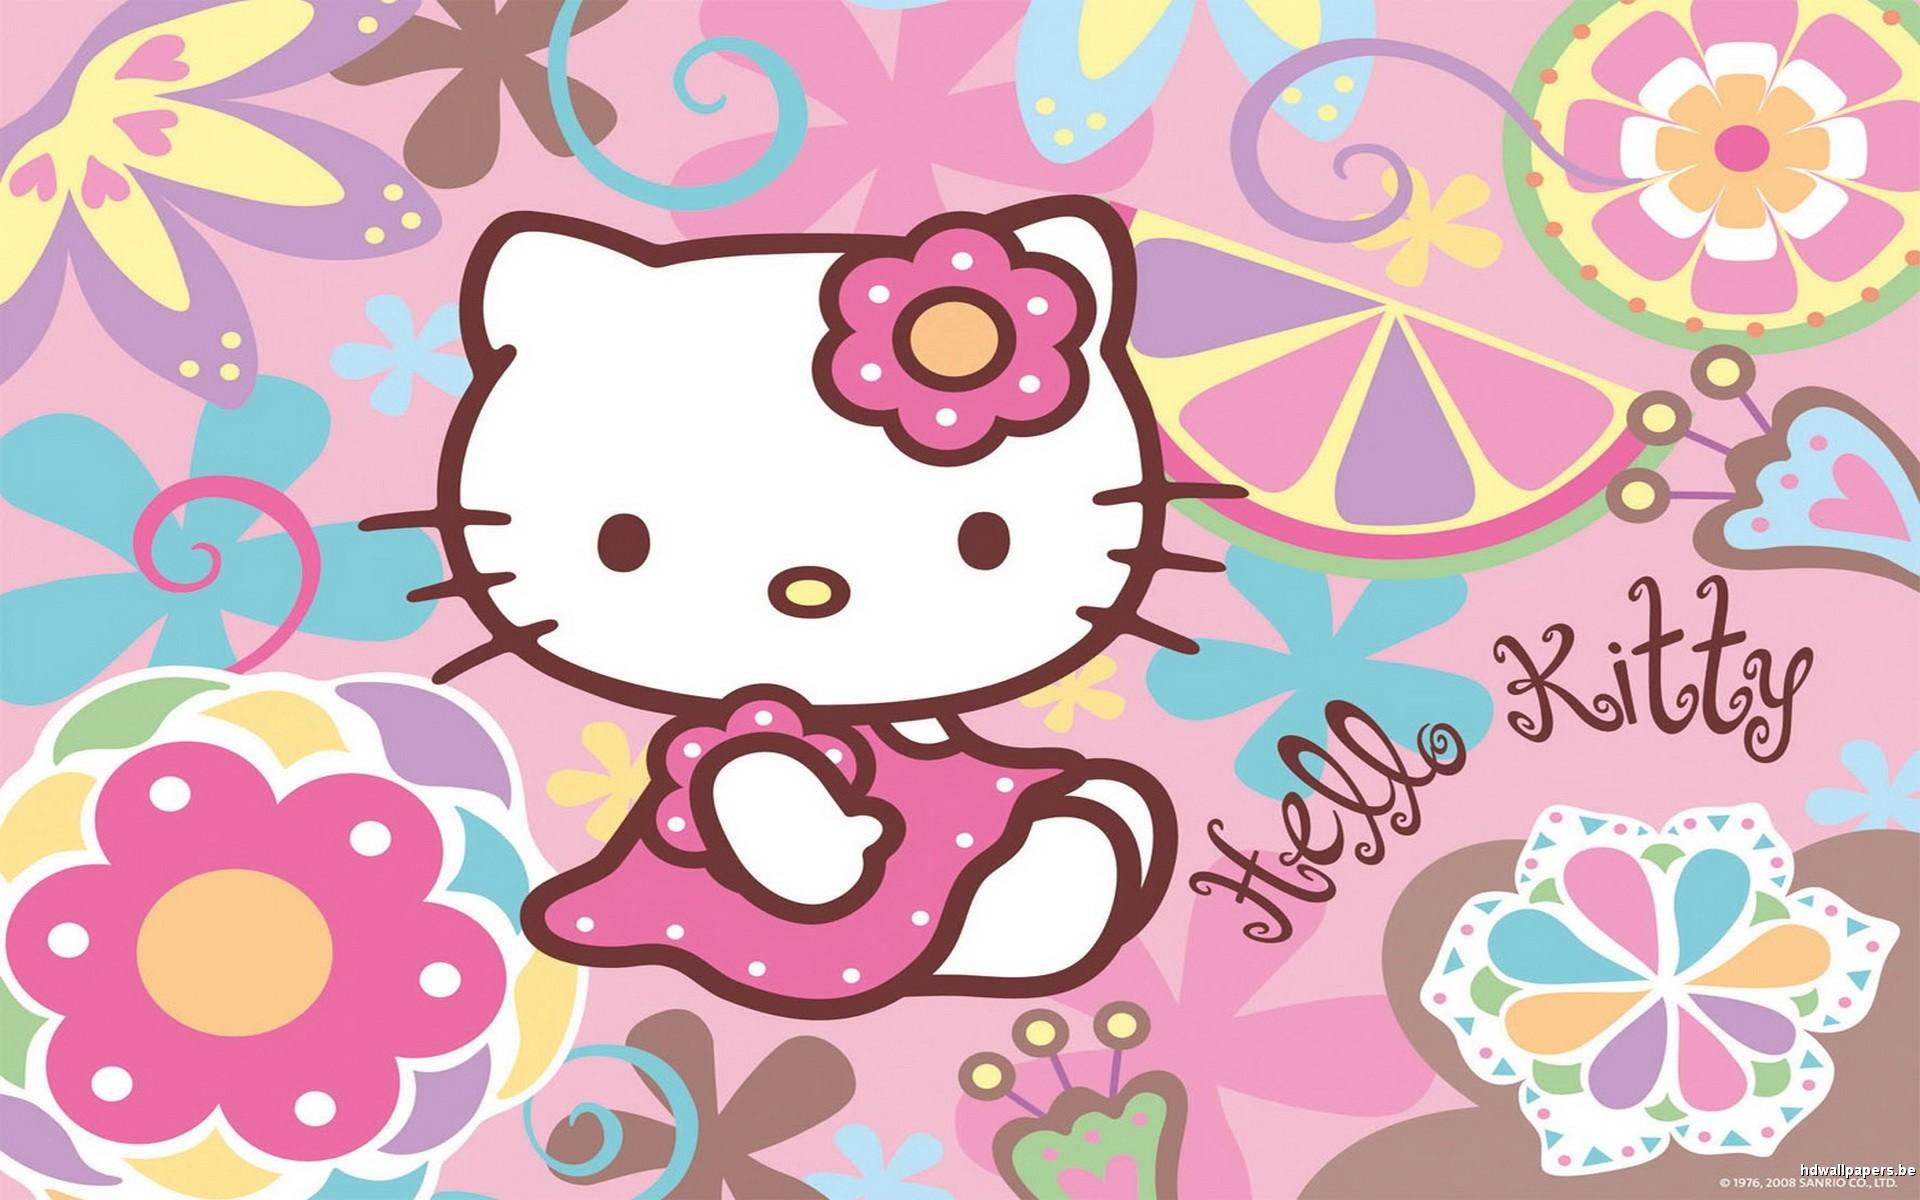 Download Wallpaper Hello Kitty Neon - 579648-vertical-hd-hello-kitty-wallpapers-1920x1200-samsung  2018_647919.jpg